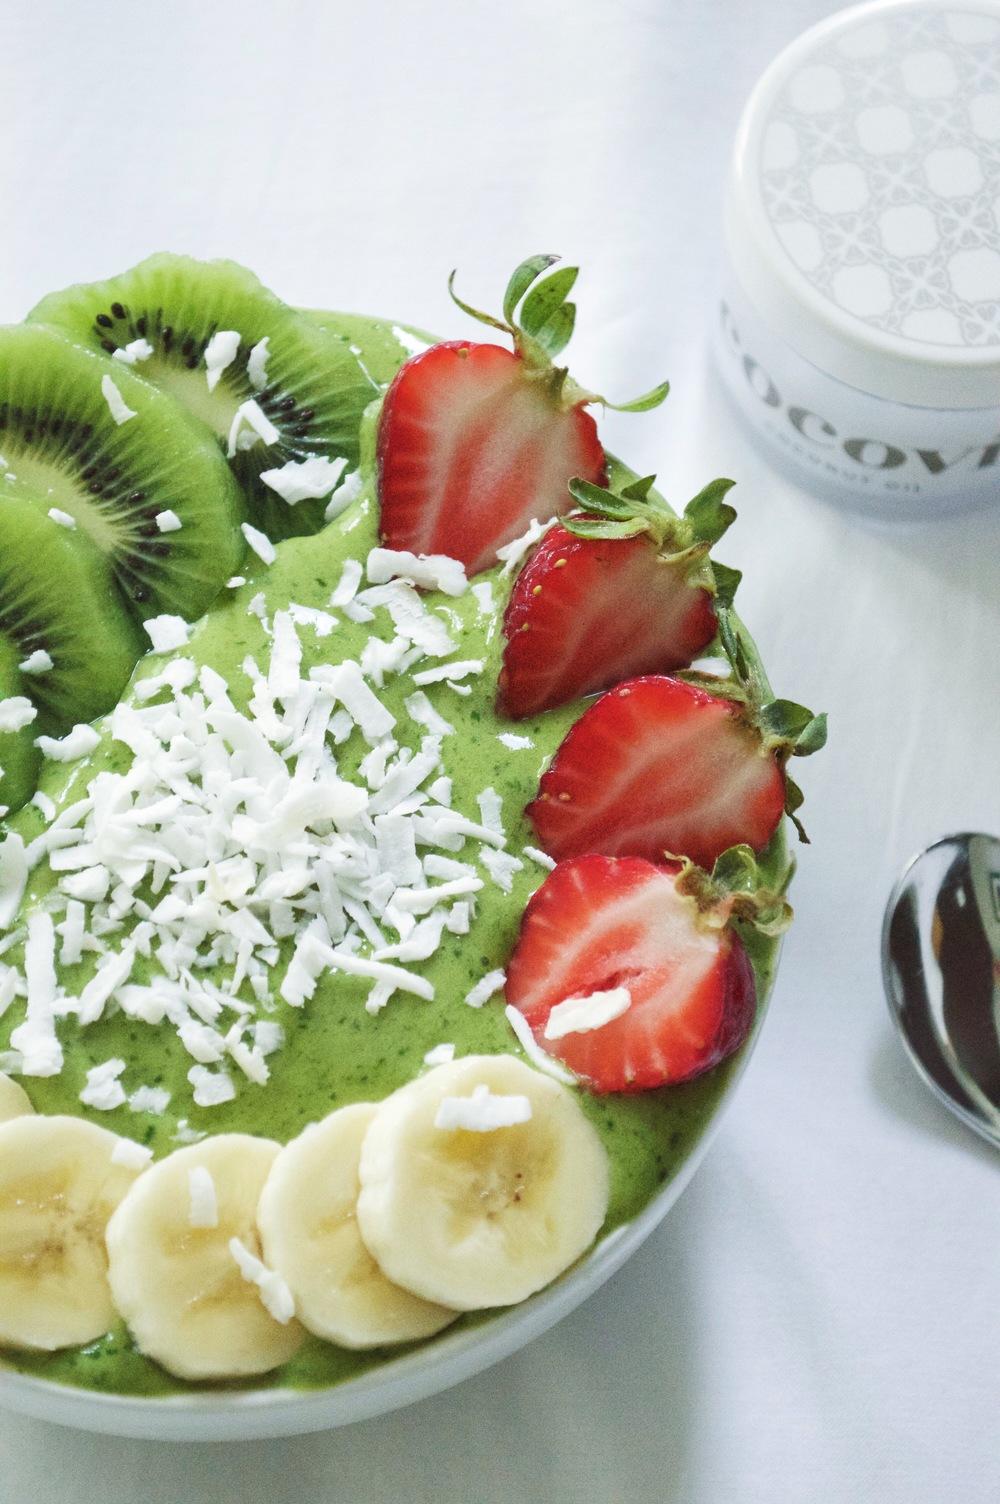 matcha-green-smoothie-bowl-cocovit-coconut-oil-laurenschwaiger-lifestyle-blog.jpg